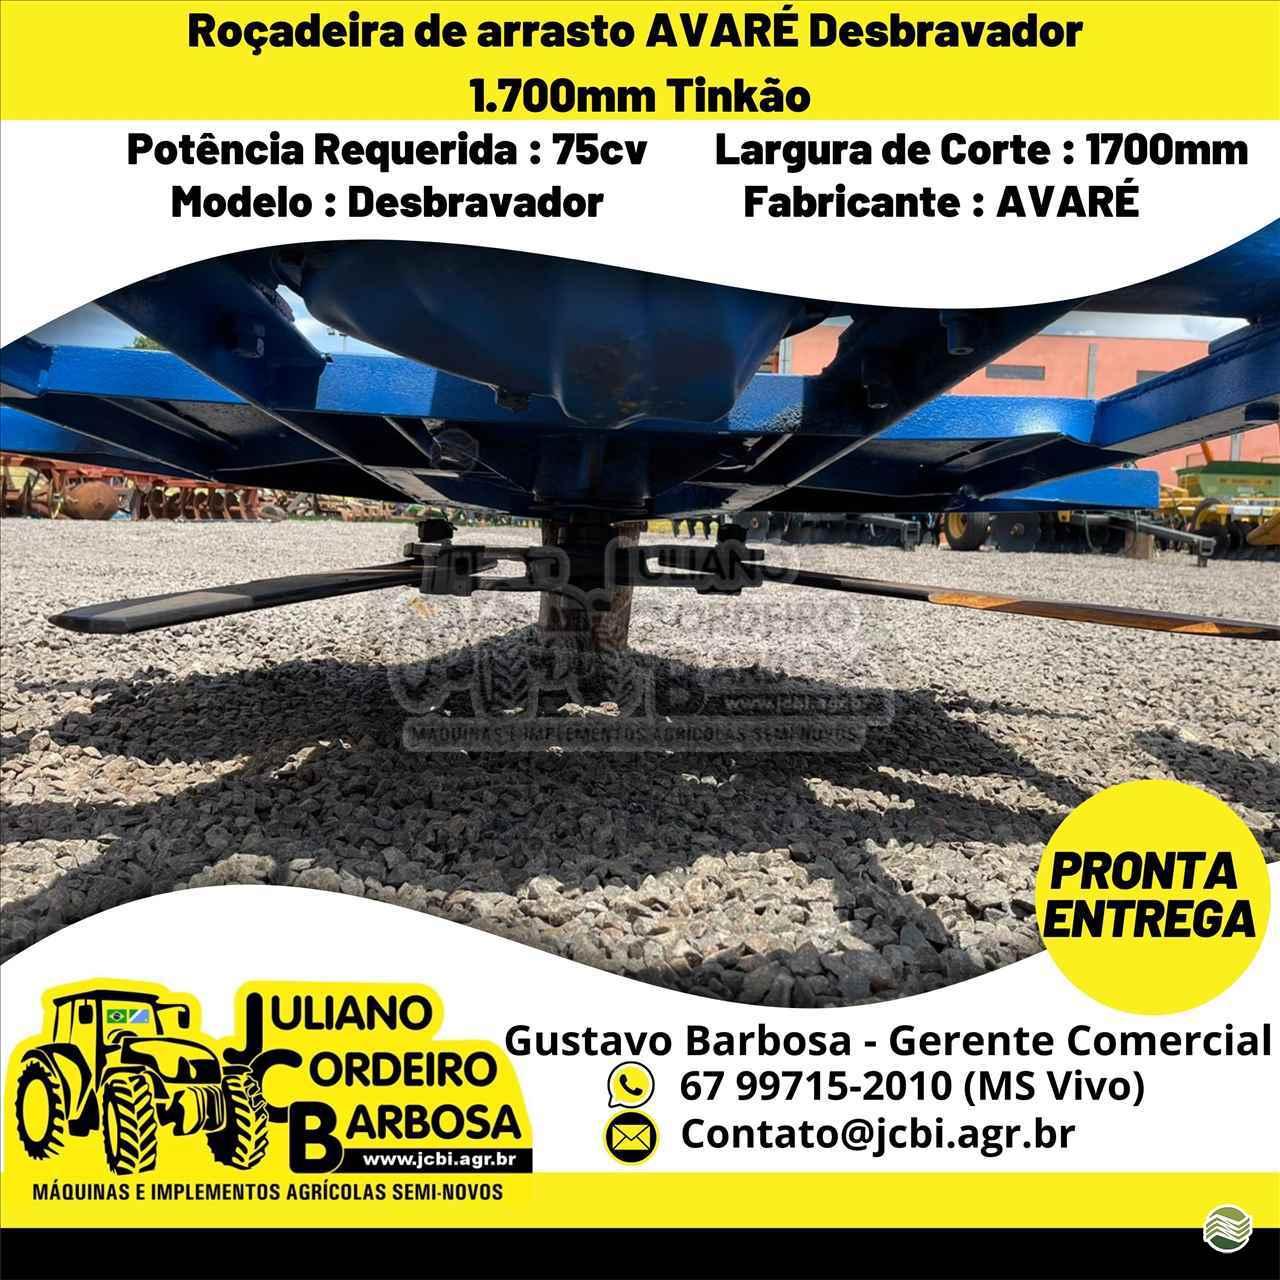 ROCADEIRA ARRASTO de JCB Máquinas e Implementos Agrícolas - MARACAJU/MS